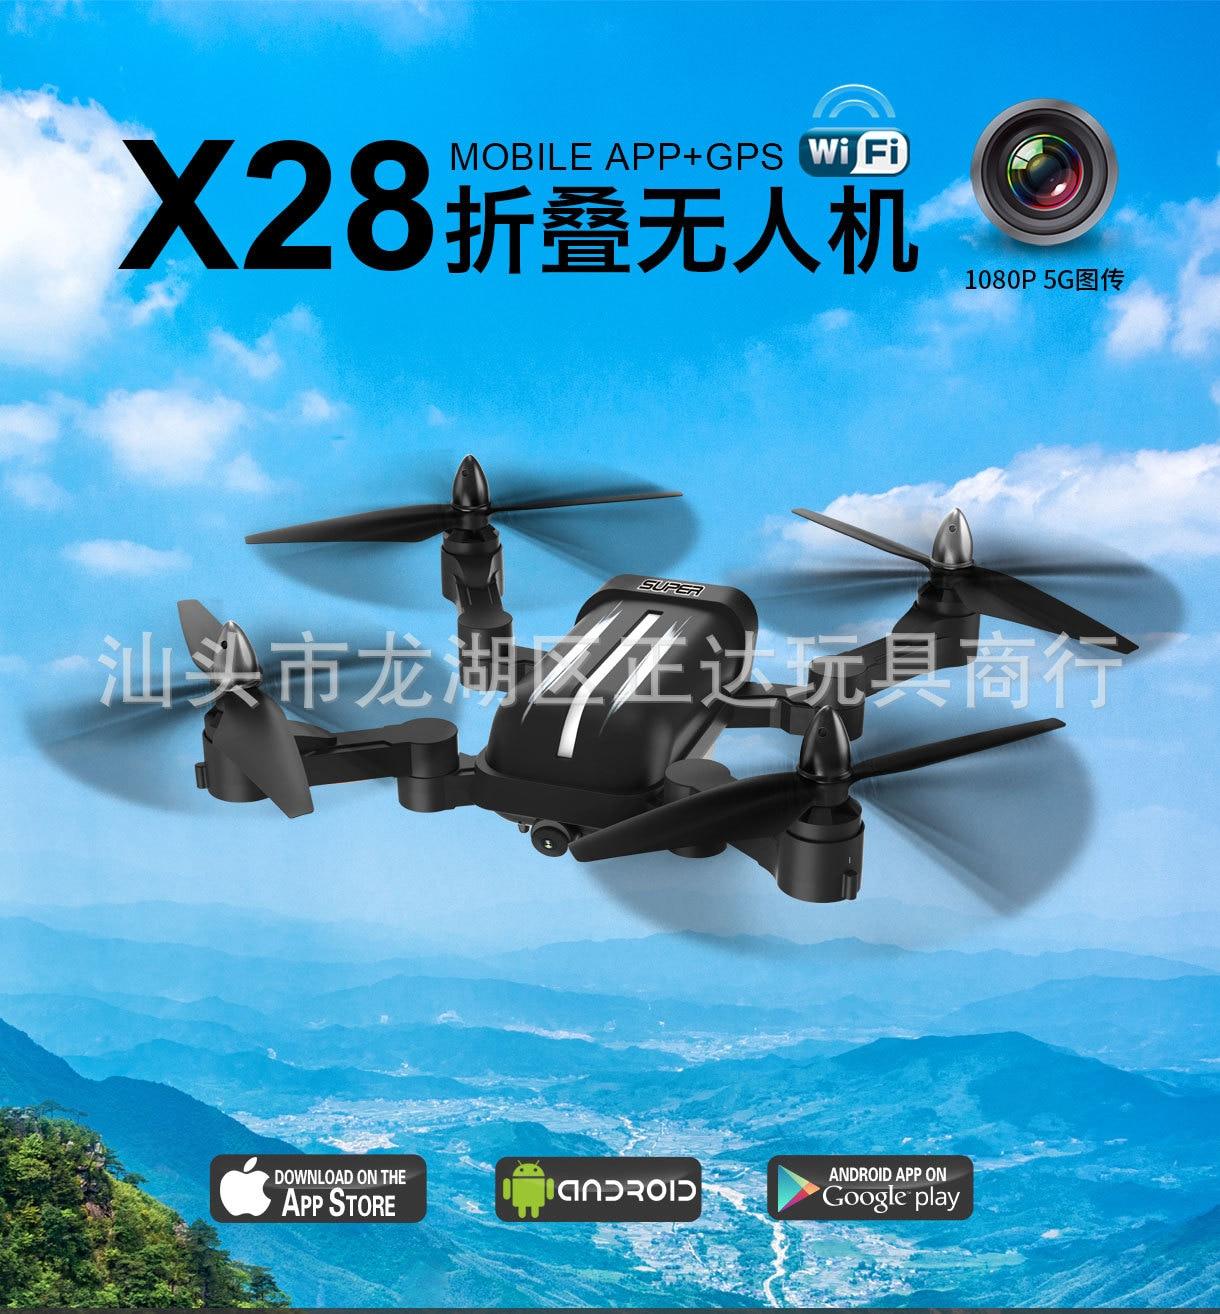 Ba Yang X28 Folding Brushless Quadcopter GPS Positioning 1080 Pwifi Image Transmission Automatic Return Unmanned Aerial Vehicle